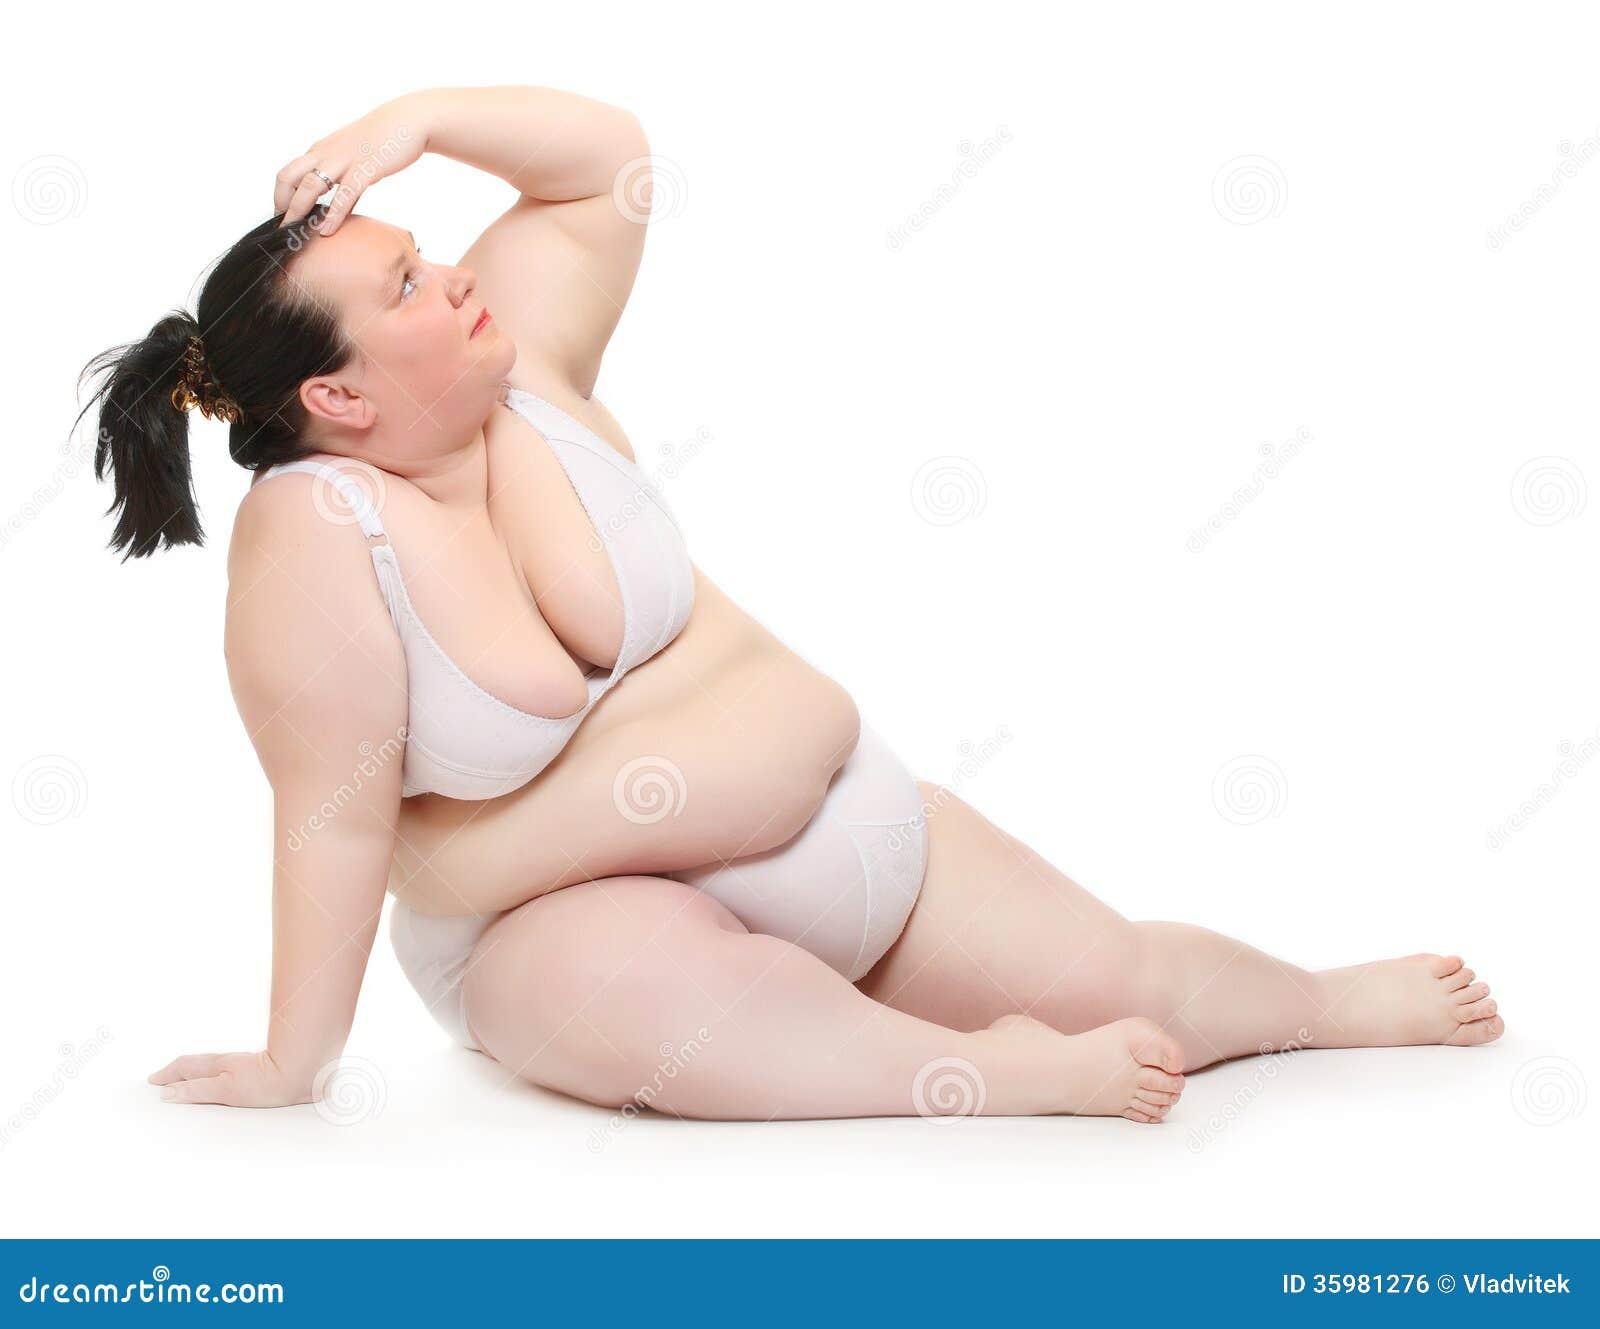 Sexy chubby girls with braces